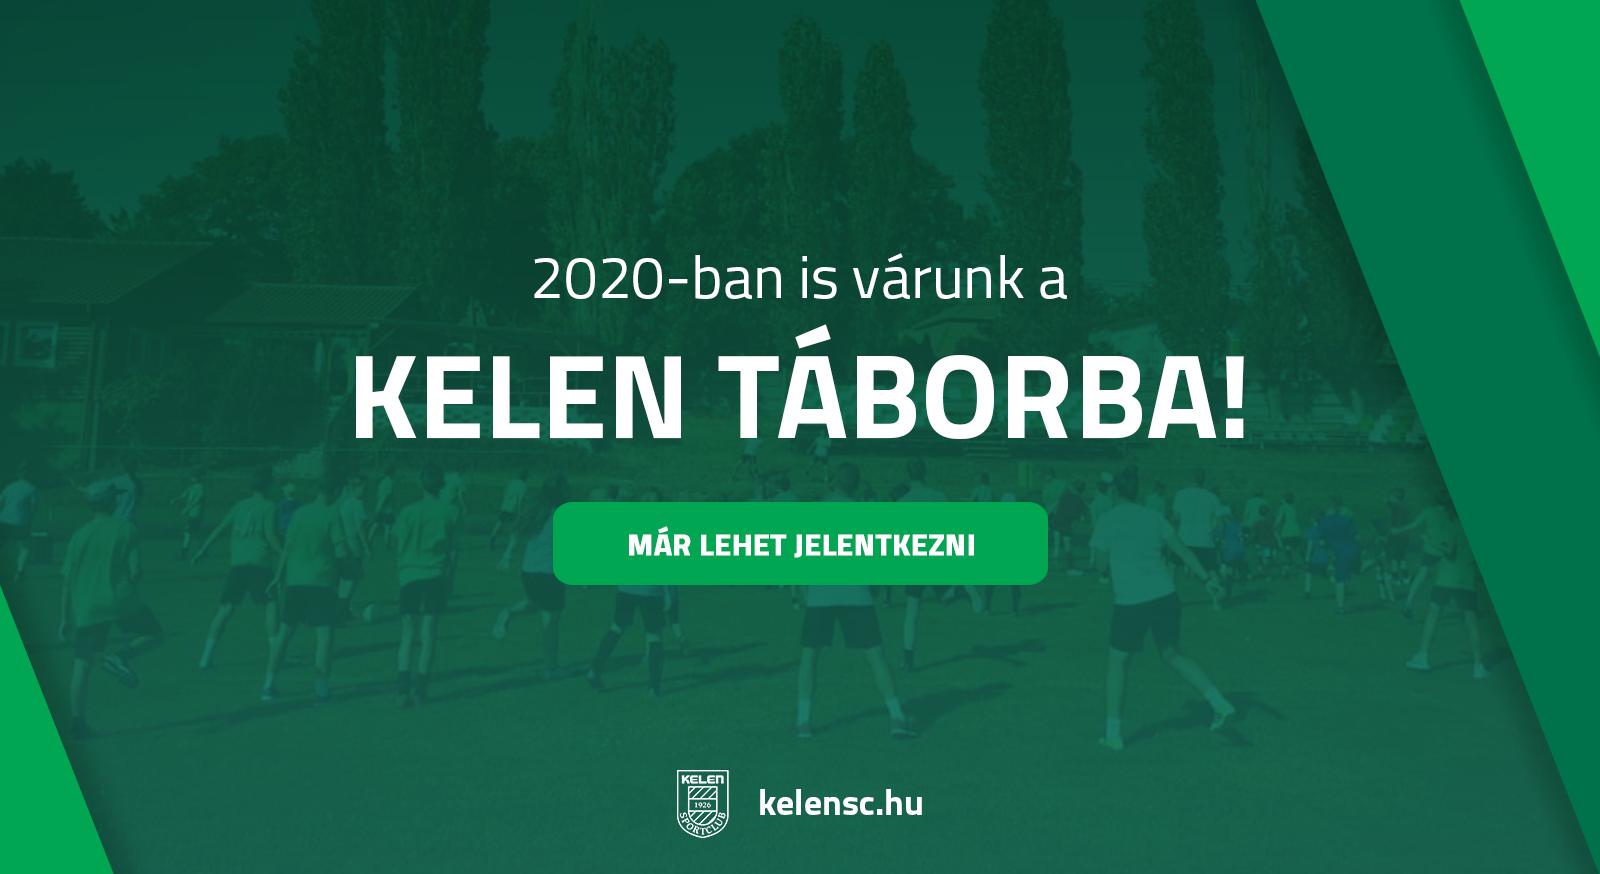 https://kelensc.hu/wp-content/uploads/2020/02/Tábor.png